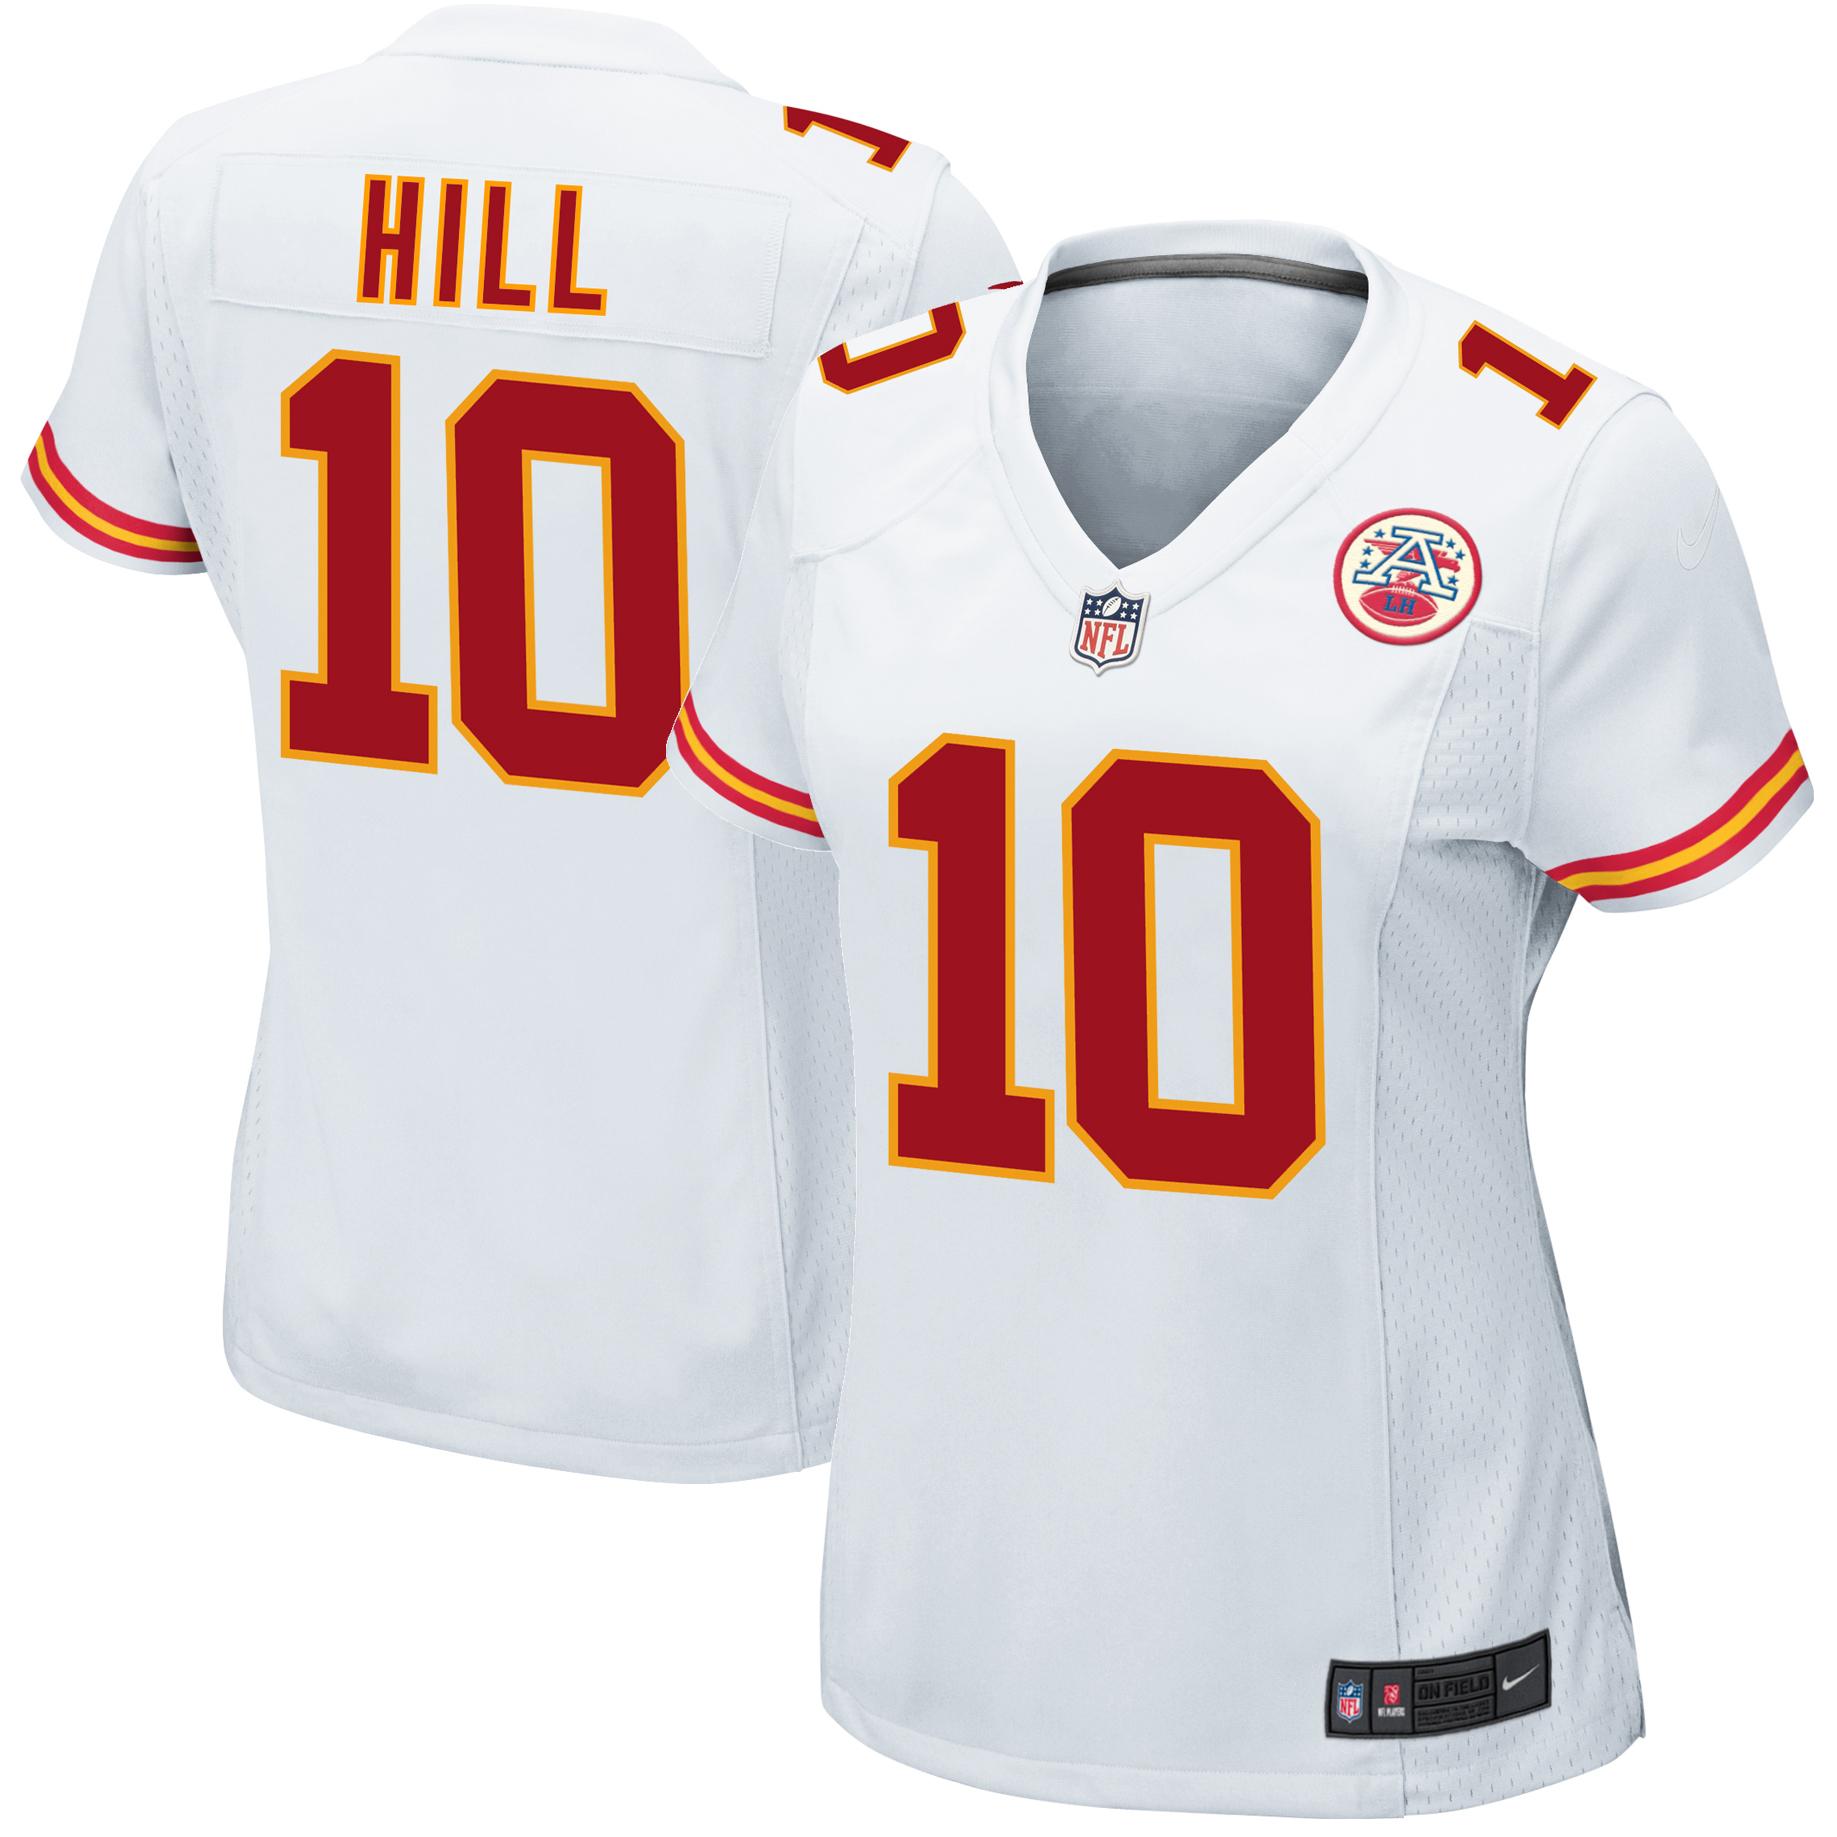 new styles 8c827 5dce4 Tyreek Hill Kansas City Chiefs Nike Women's Game Jersey - White sold by  Best Jerseys